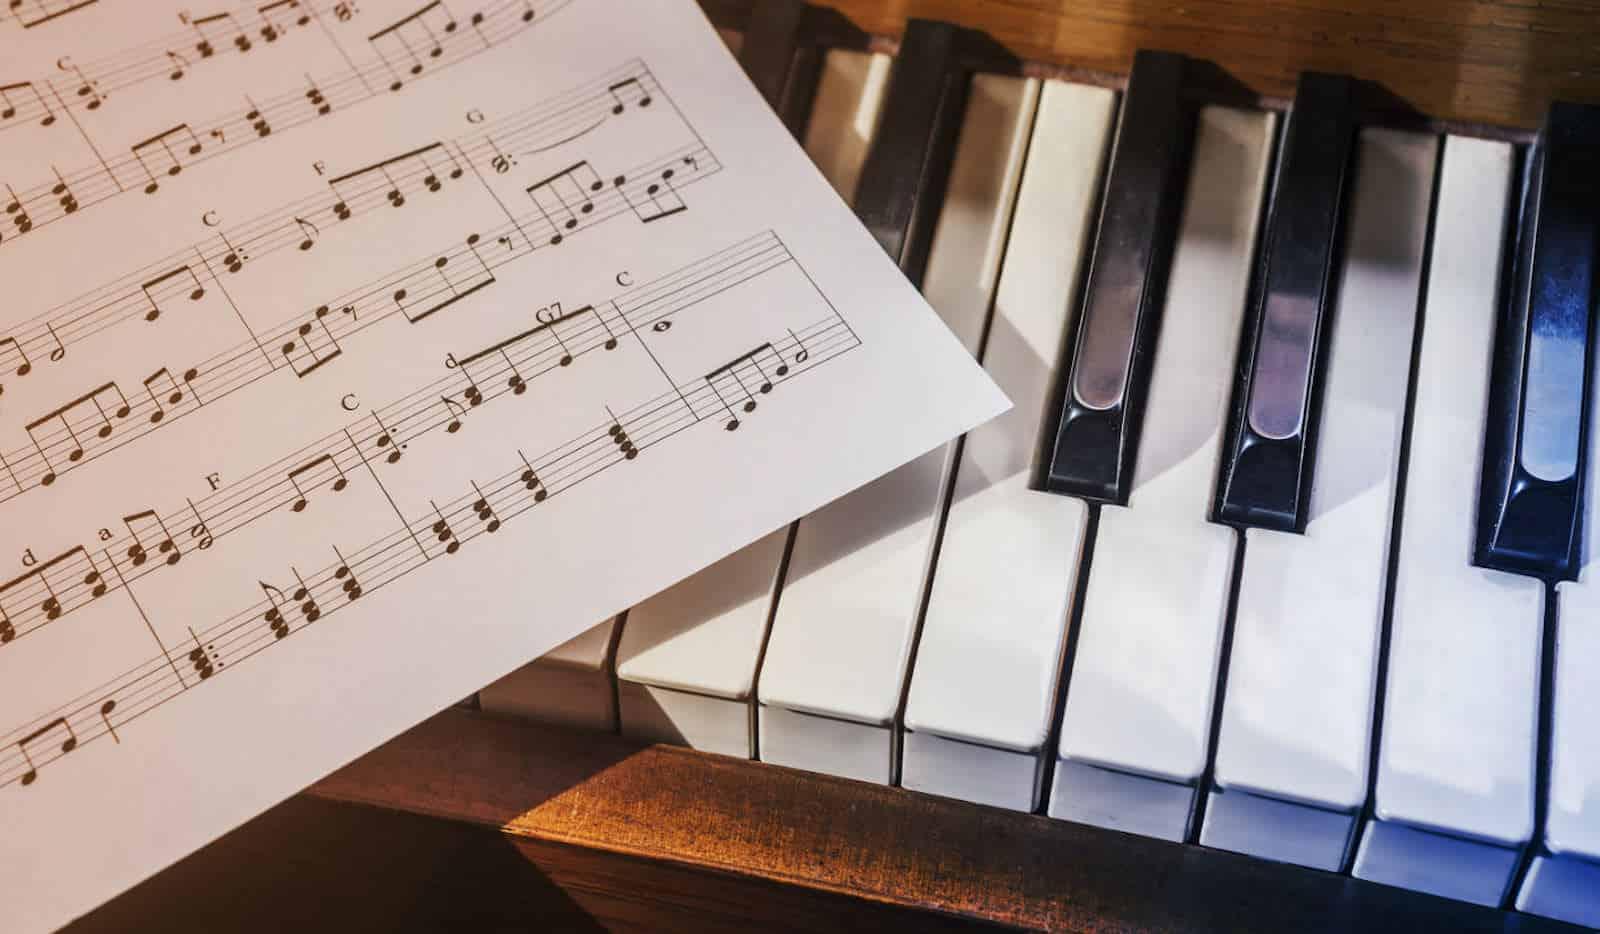 Занятия на гитаре, фортепиано либо саксофоне в Москве